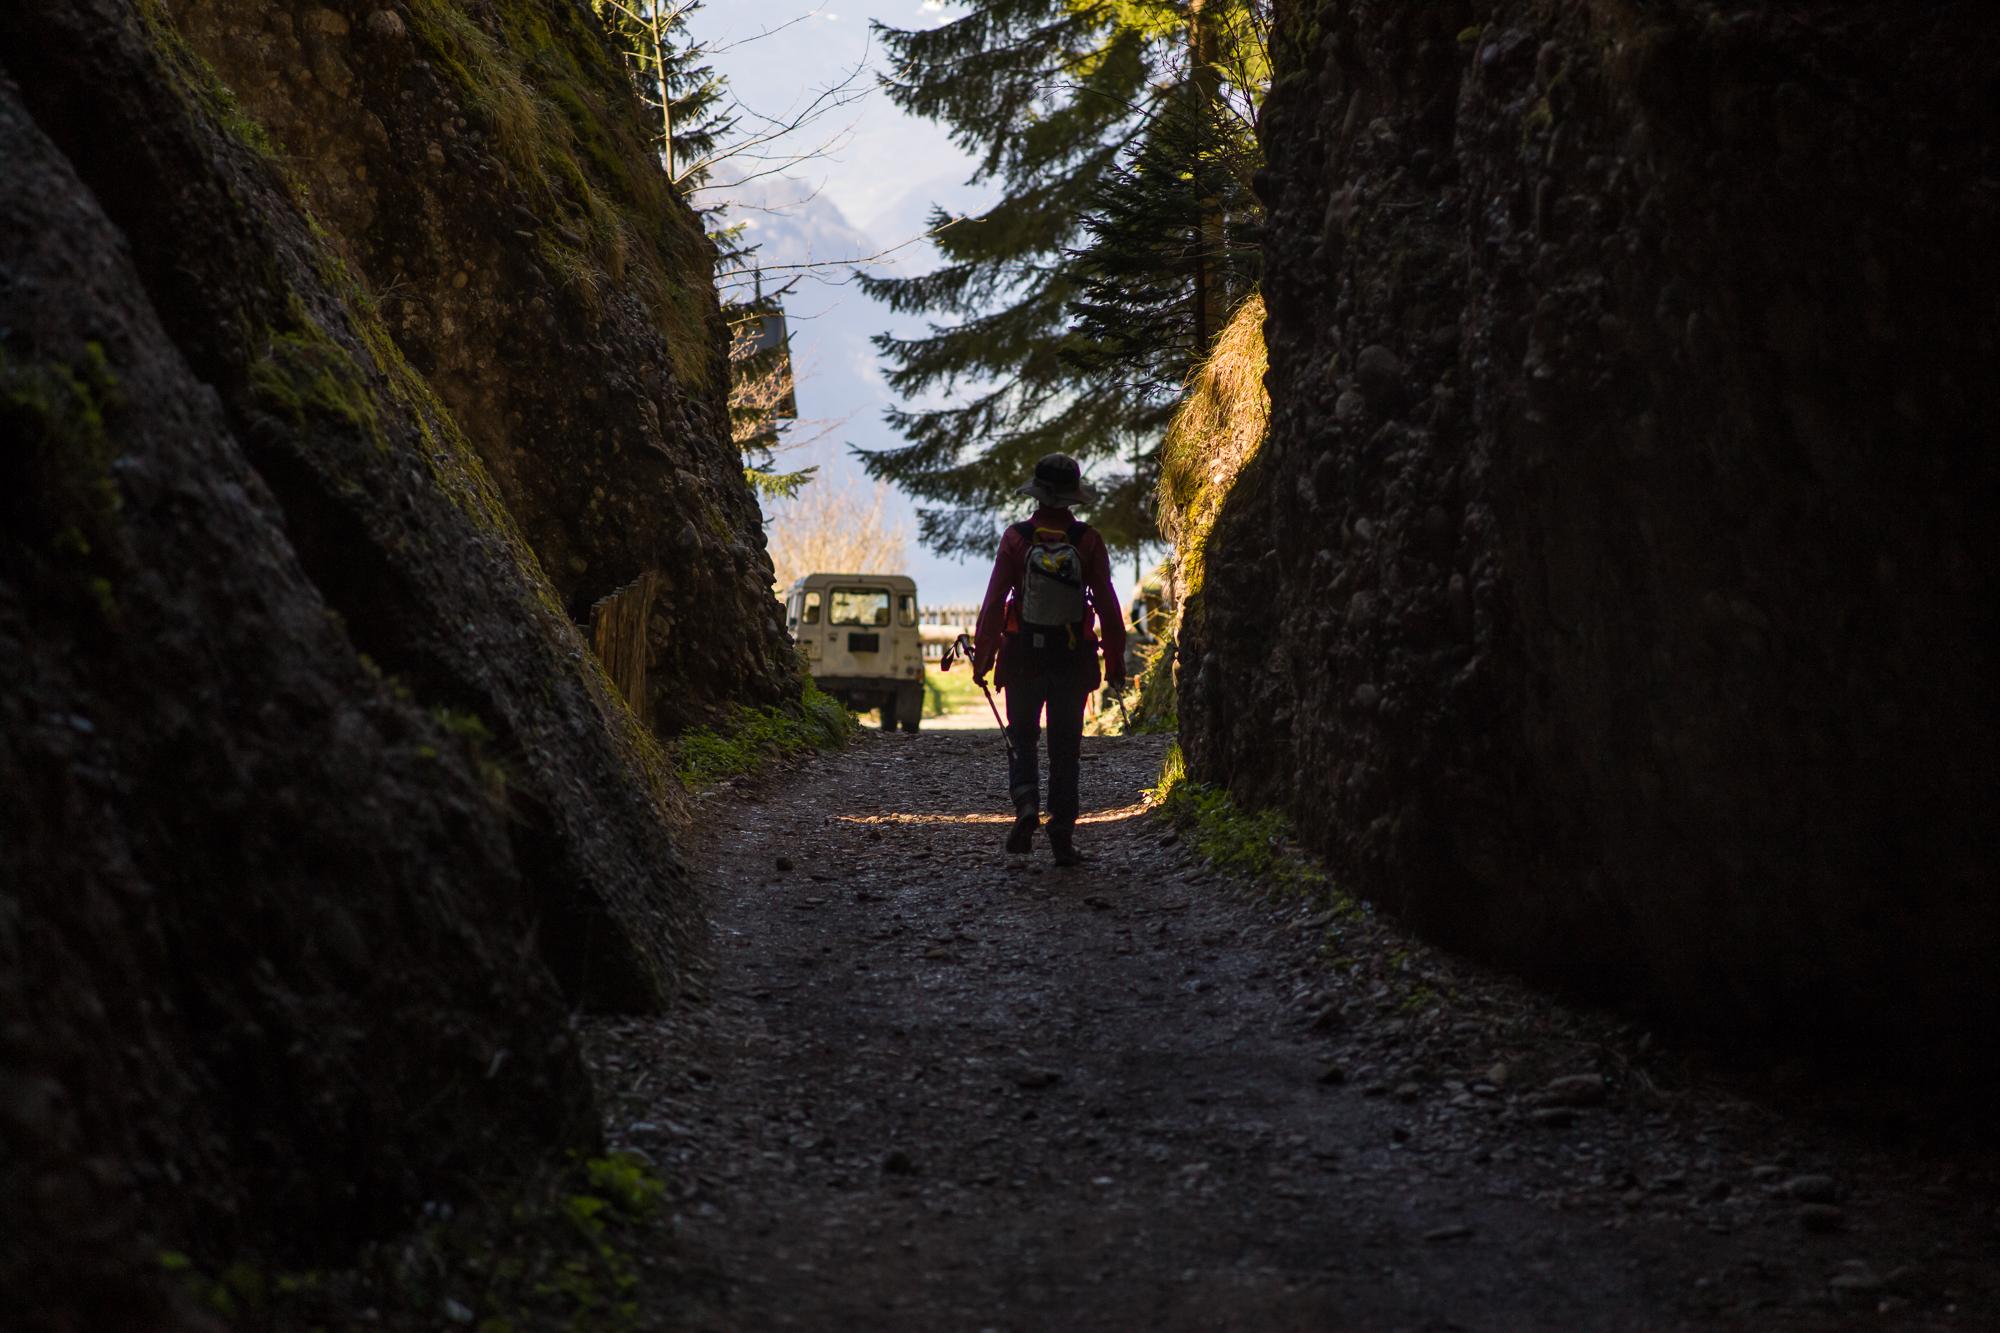 Buddhist Retreat Center on the Rigi-Weggis hike